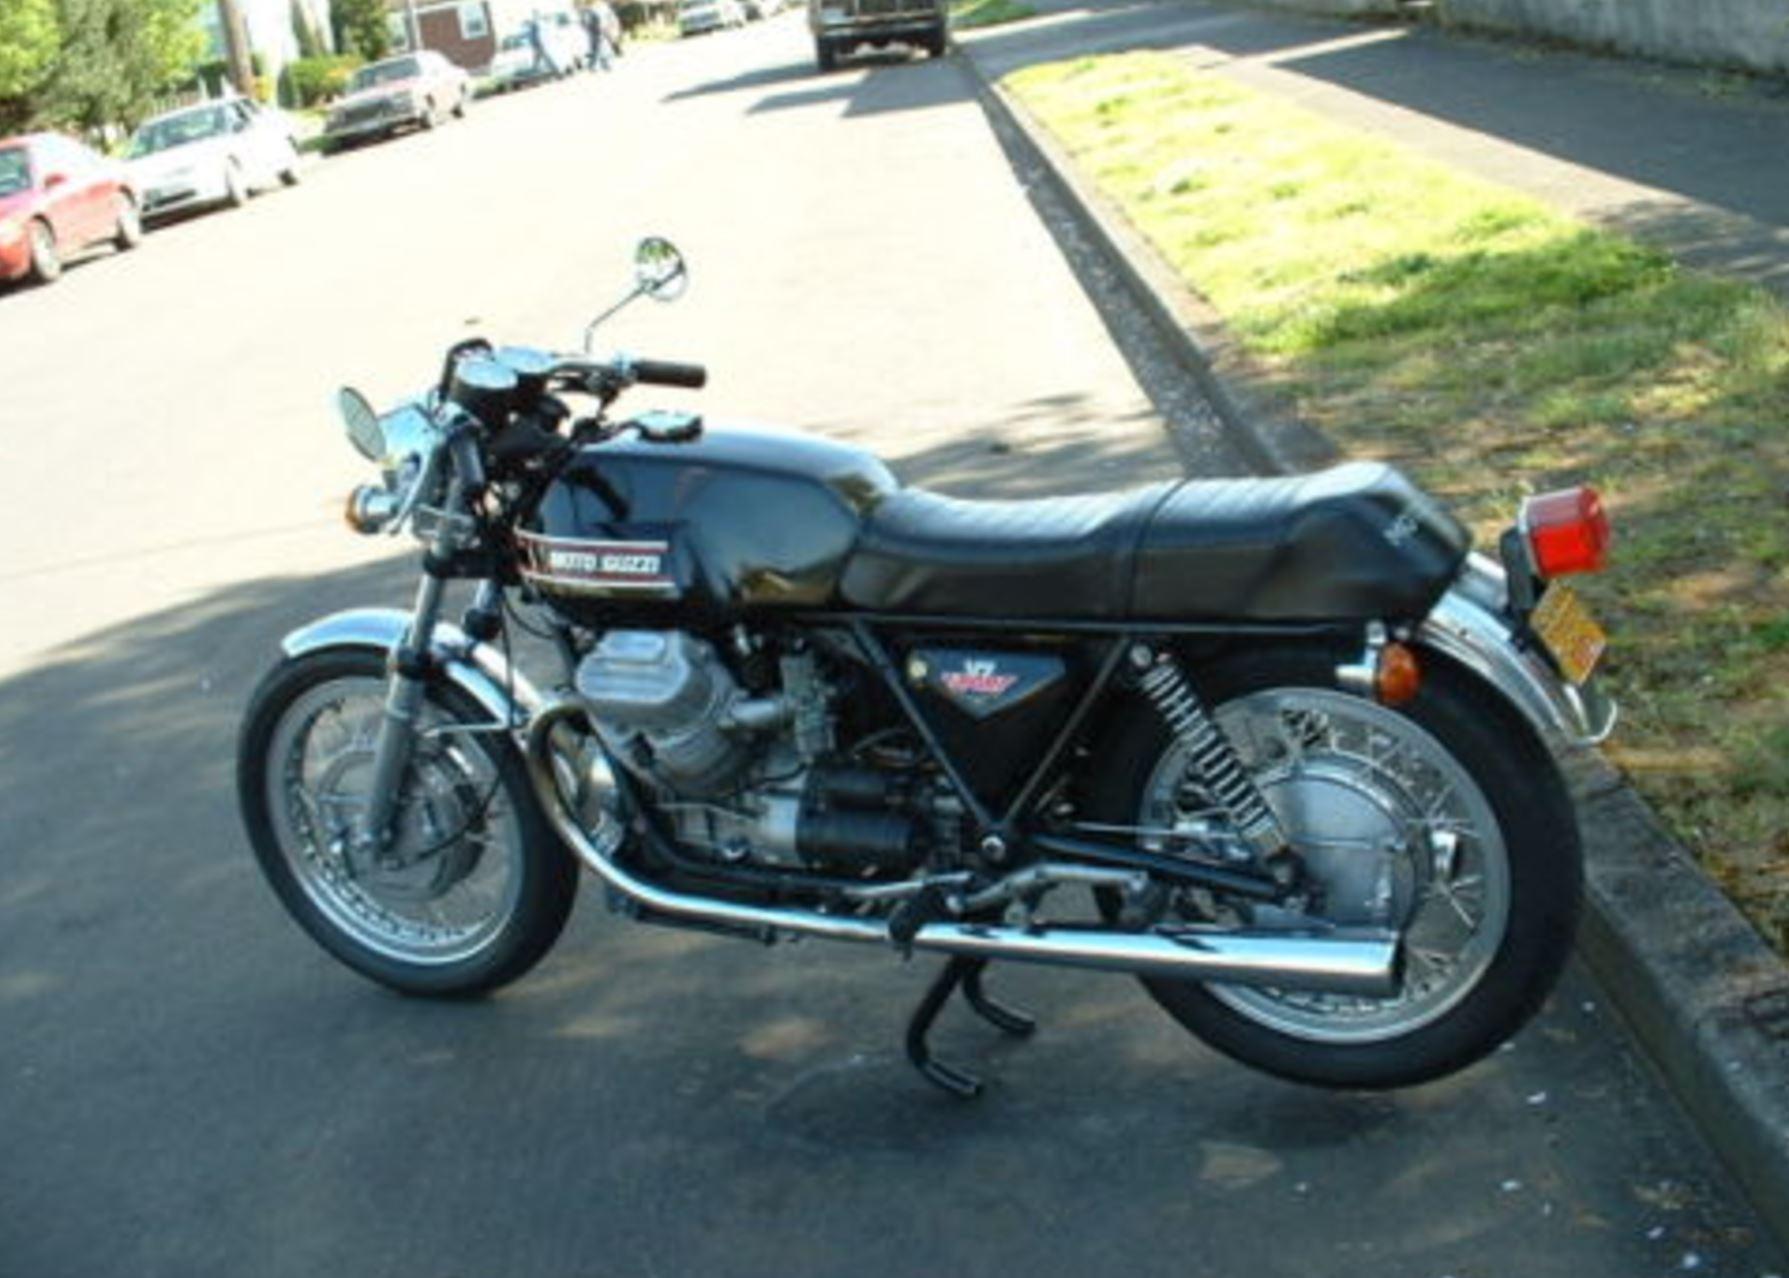 """Sophia"" – 1974 Moto Guzzi V7 Sport – Sophia sold for  10 8a90ae6b2"